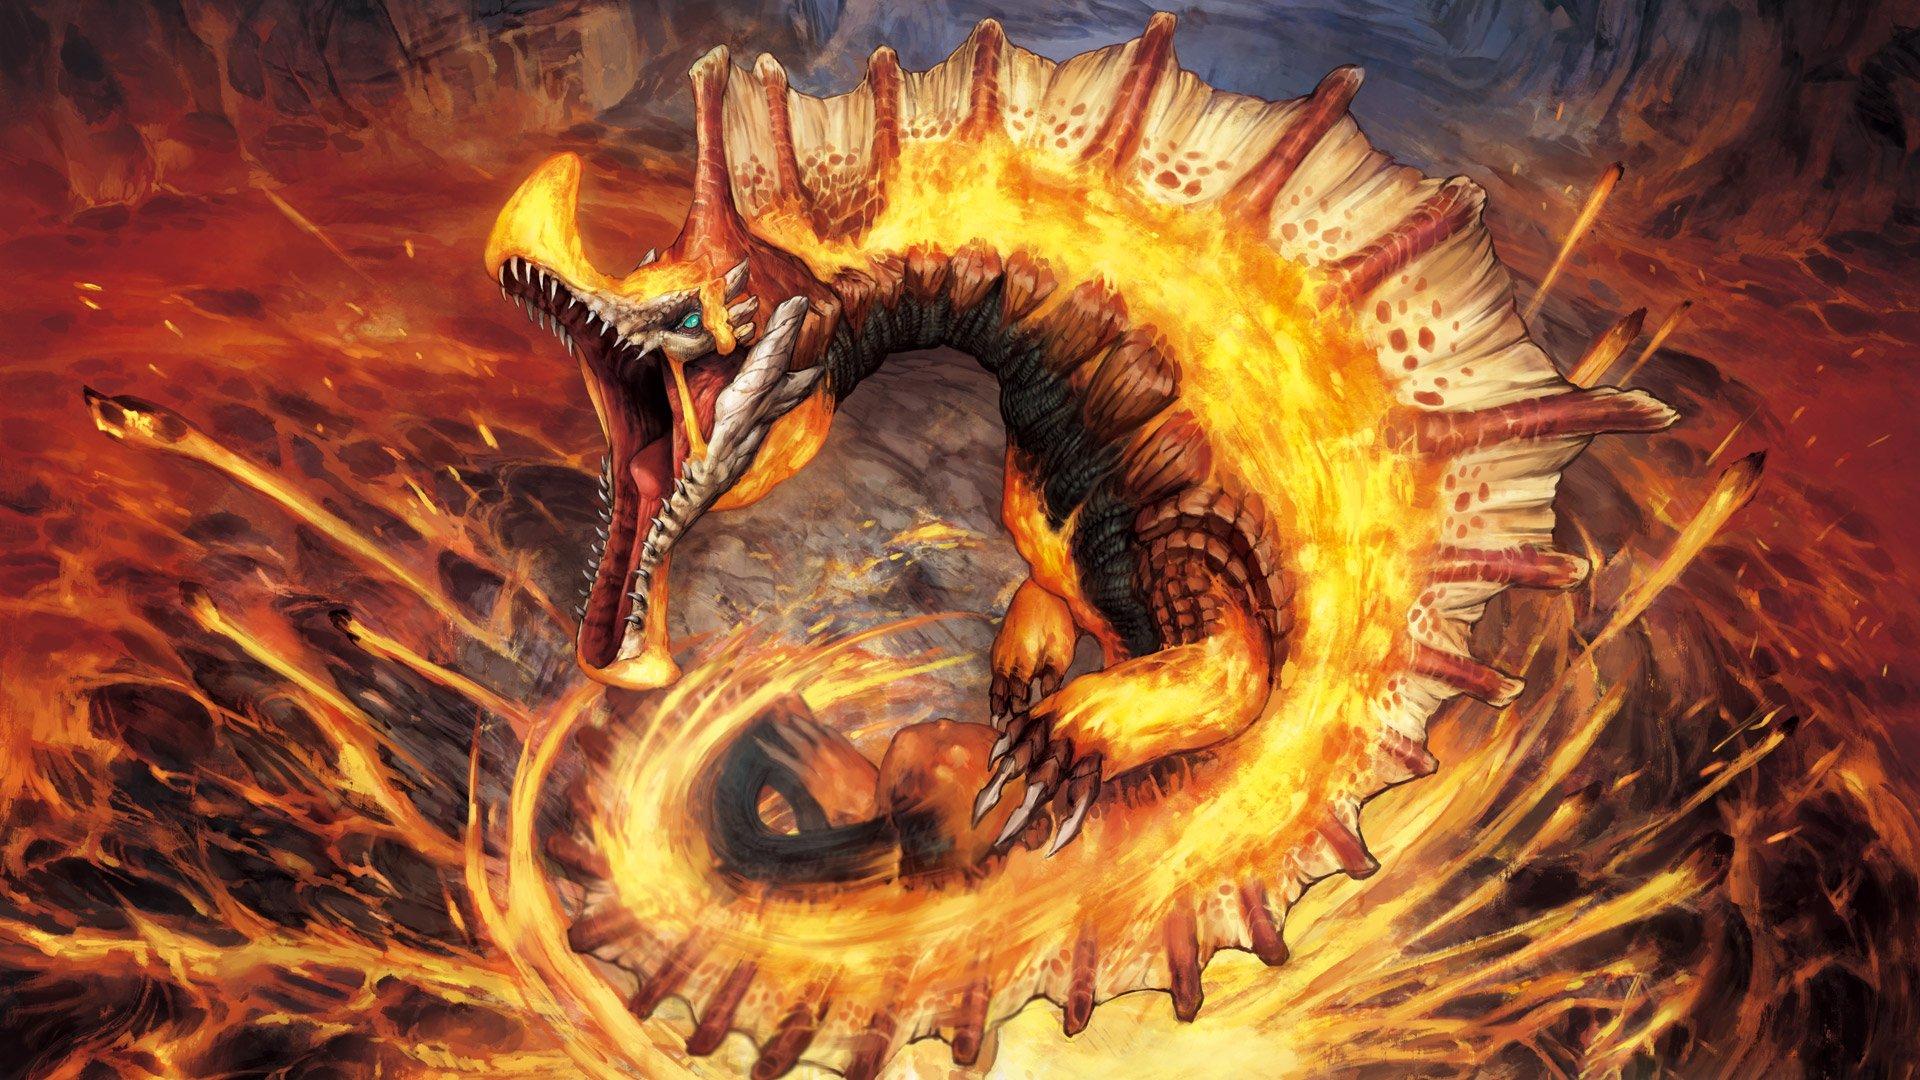 Monster Hunter HD Wallpaper | Background Image | 1920x1080 ...